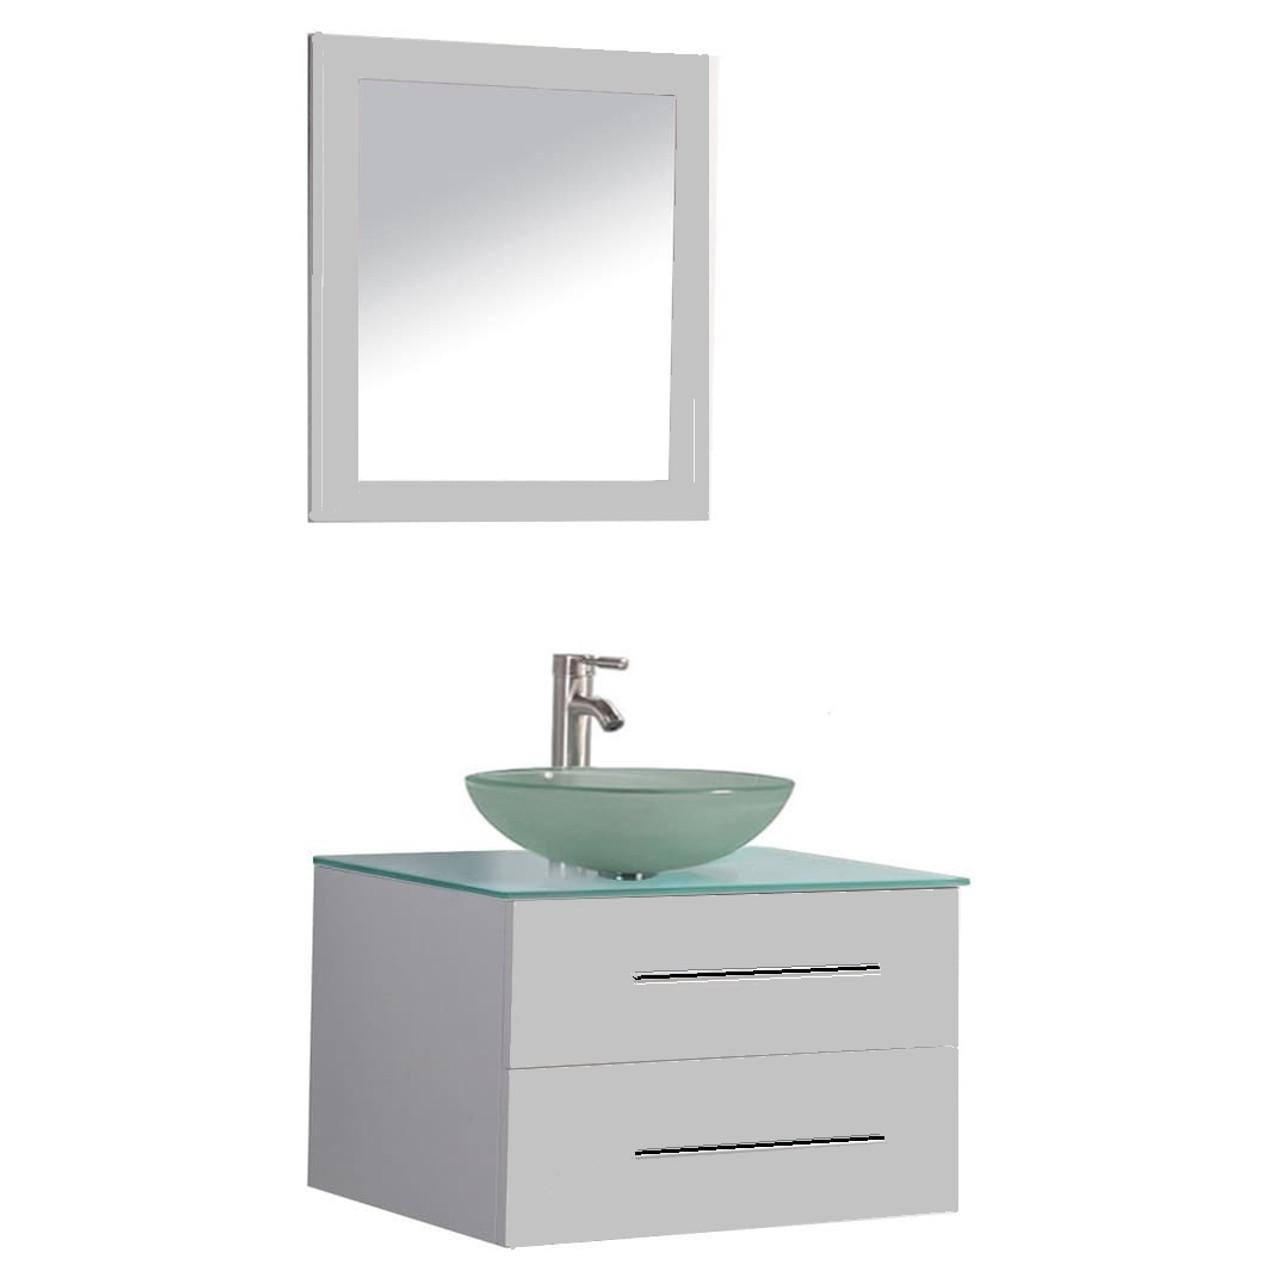 Lorixon Lv 10 30 24 Gray Modern Floating Bathroom Vanity Wall Mount Cabinet Frost Glass